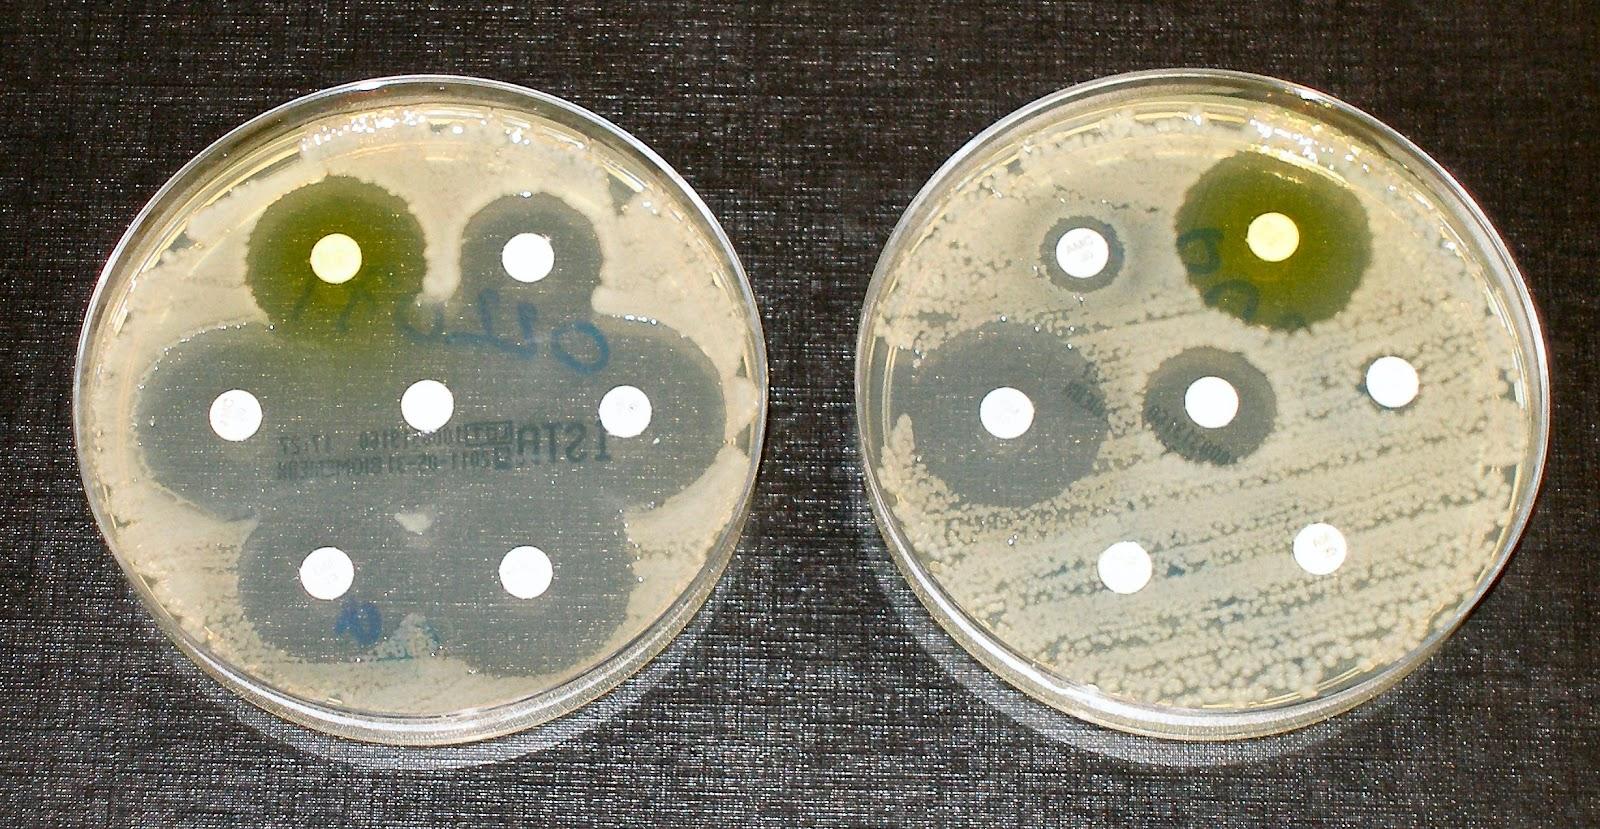 Bacteria antisusceptibility